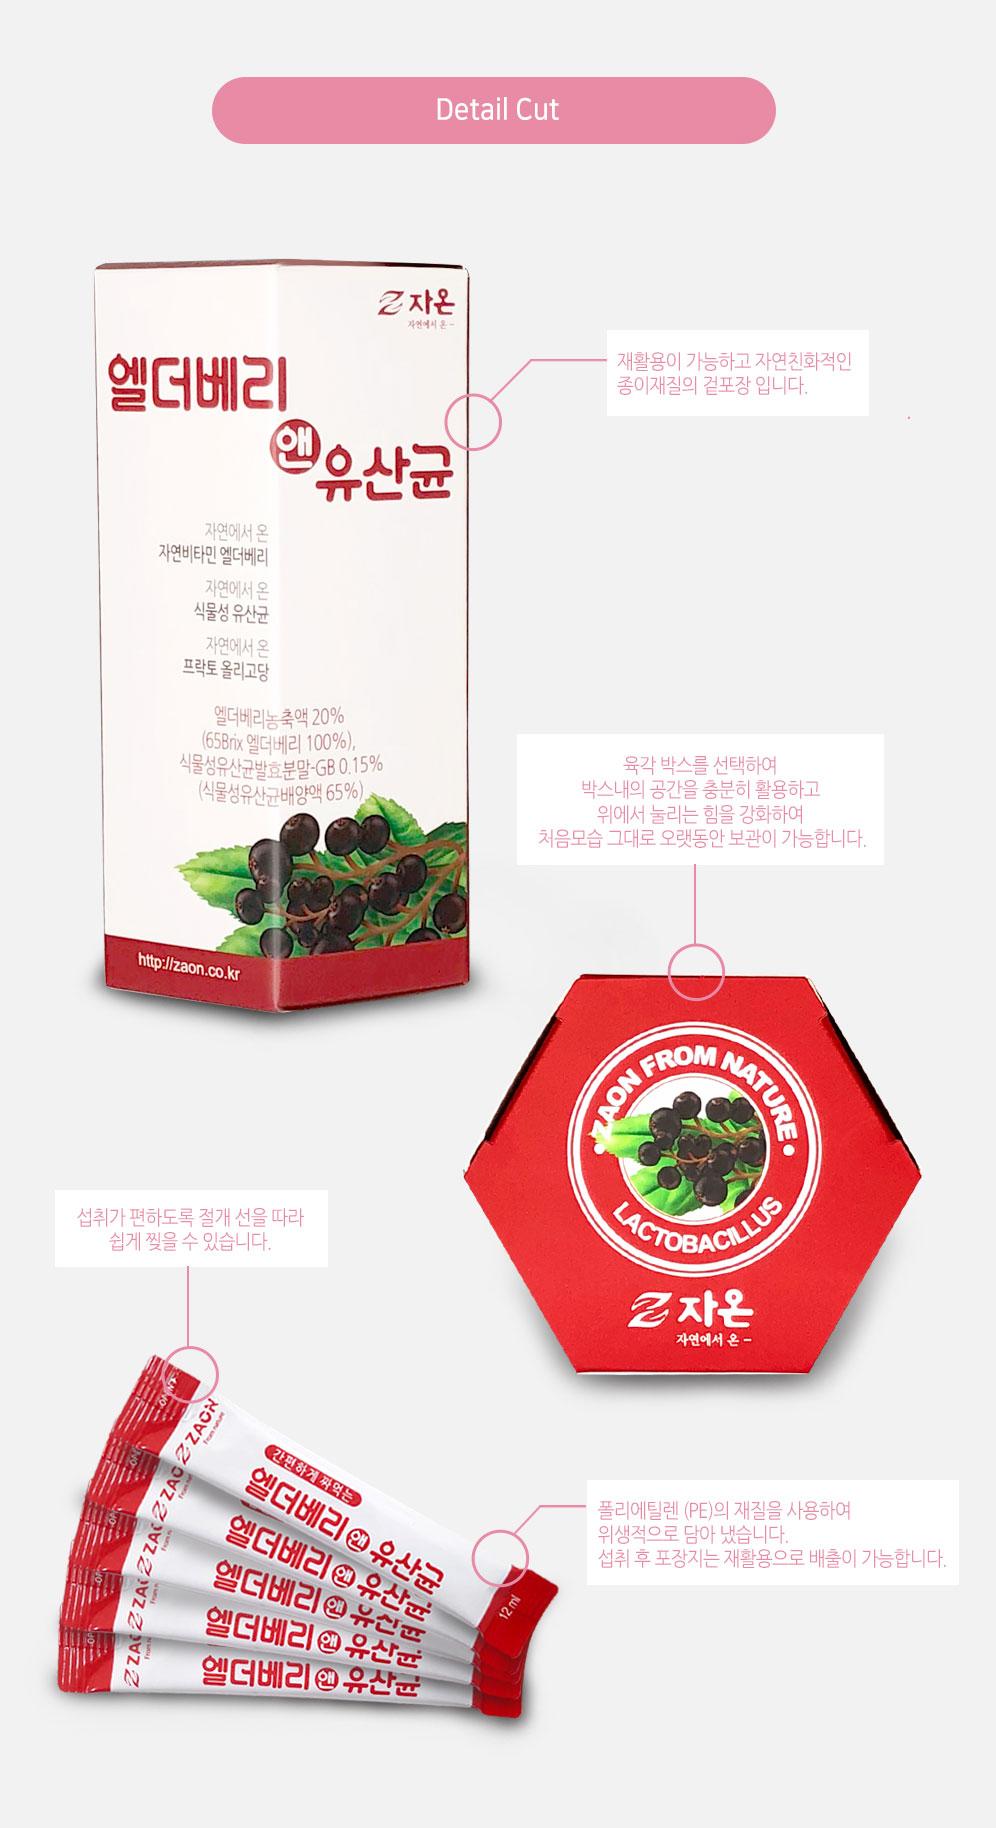 elderberry_21.jpg